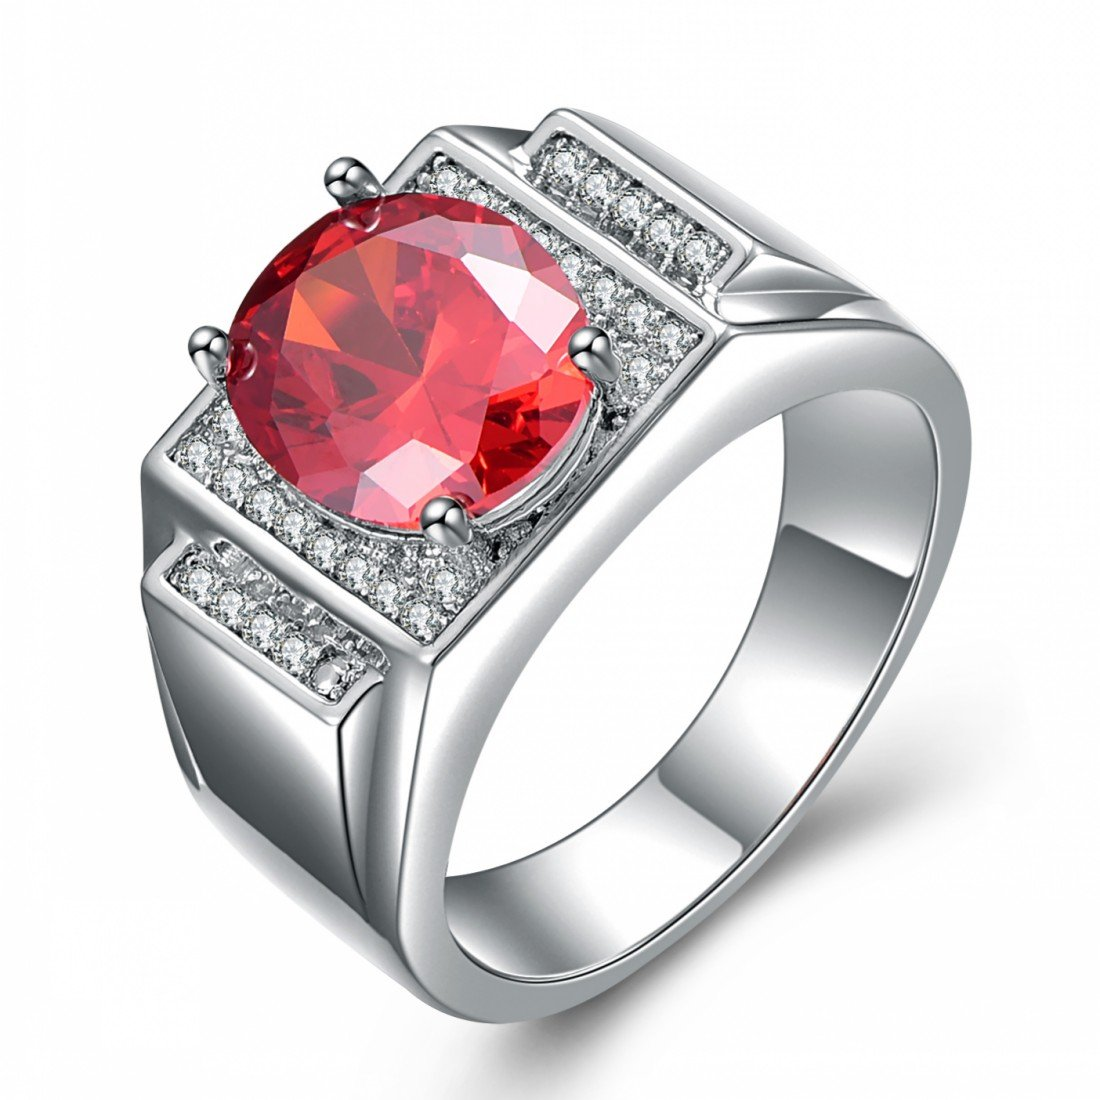 Songdetao Men's Oval Cut Ruby Garnet CZ White Gold I.P. Vintage Wedding Rings Size 8